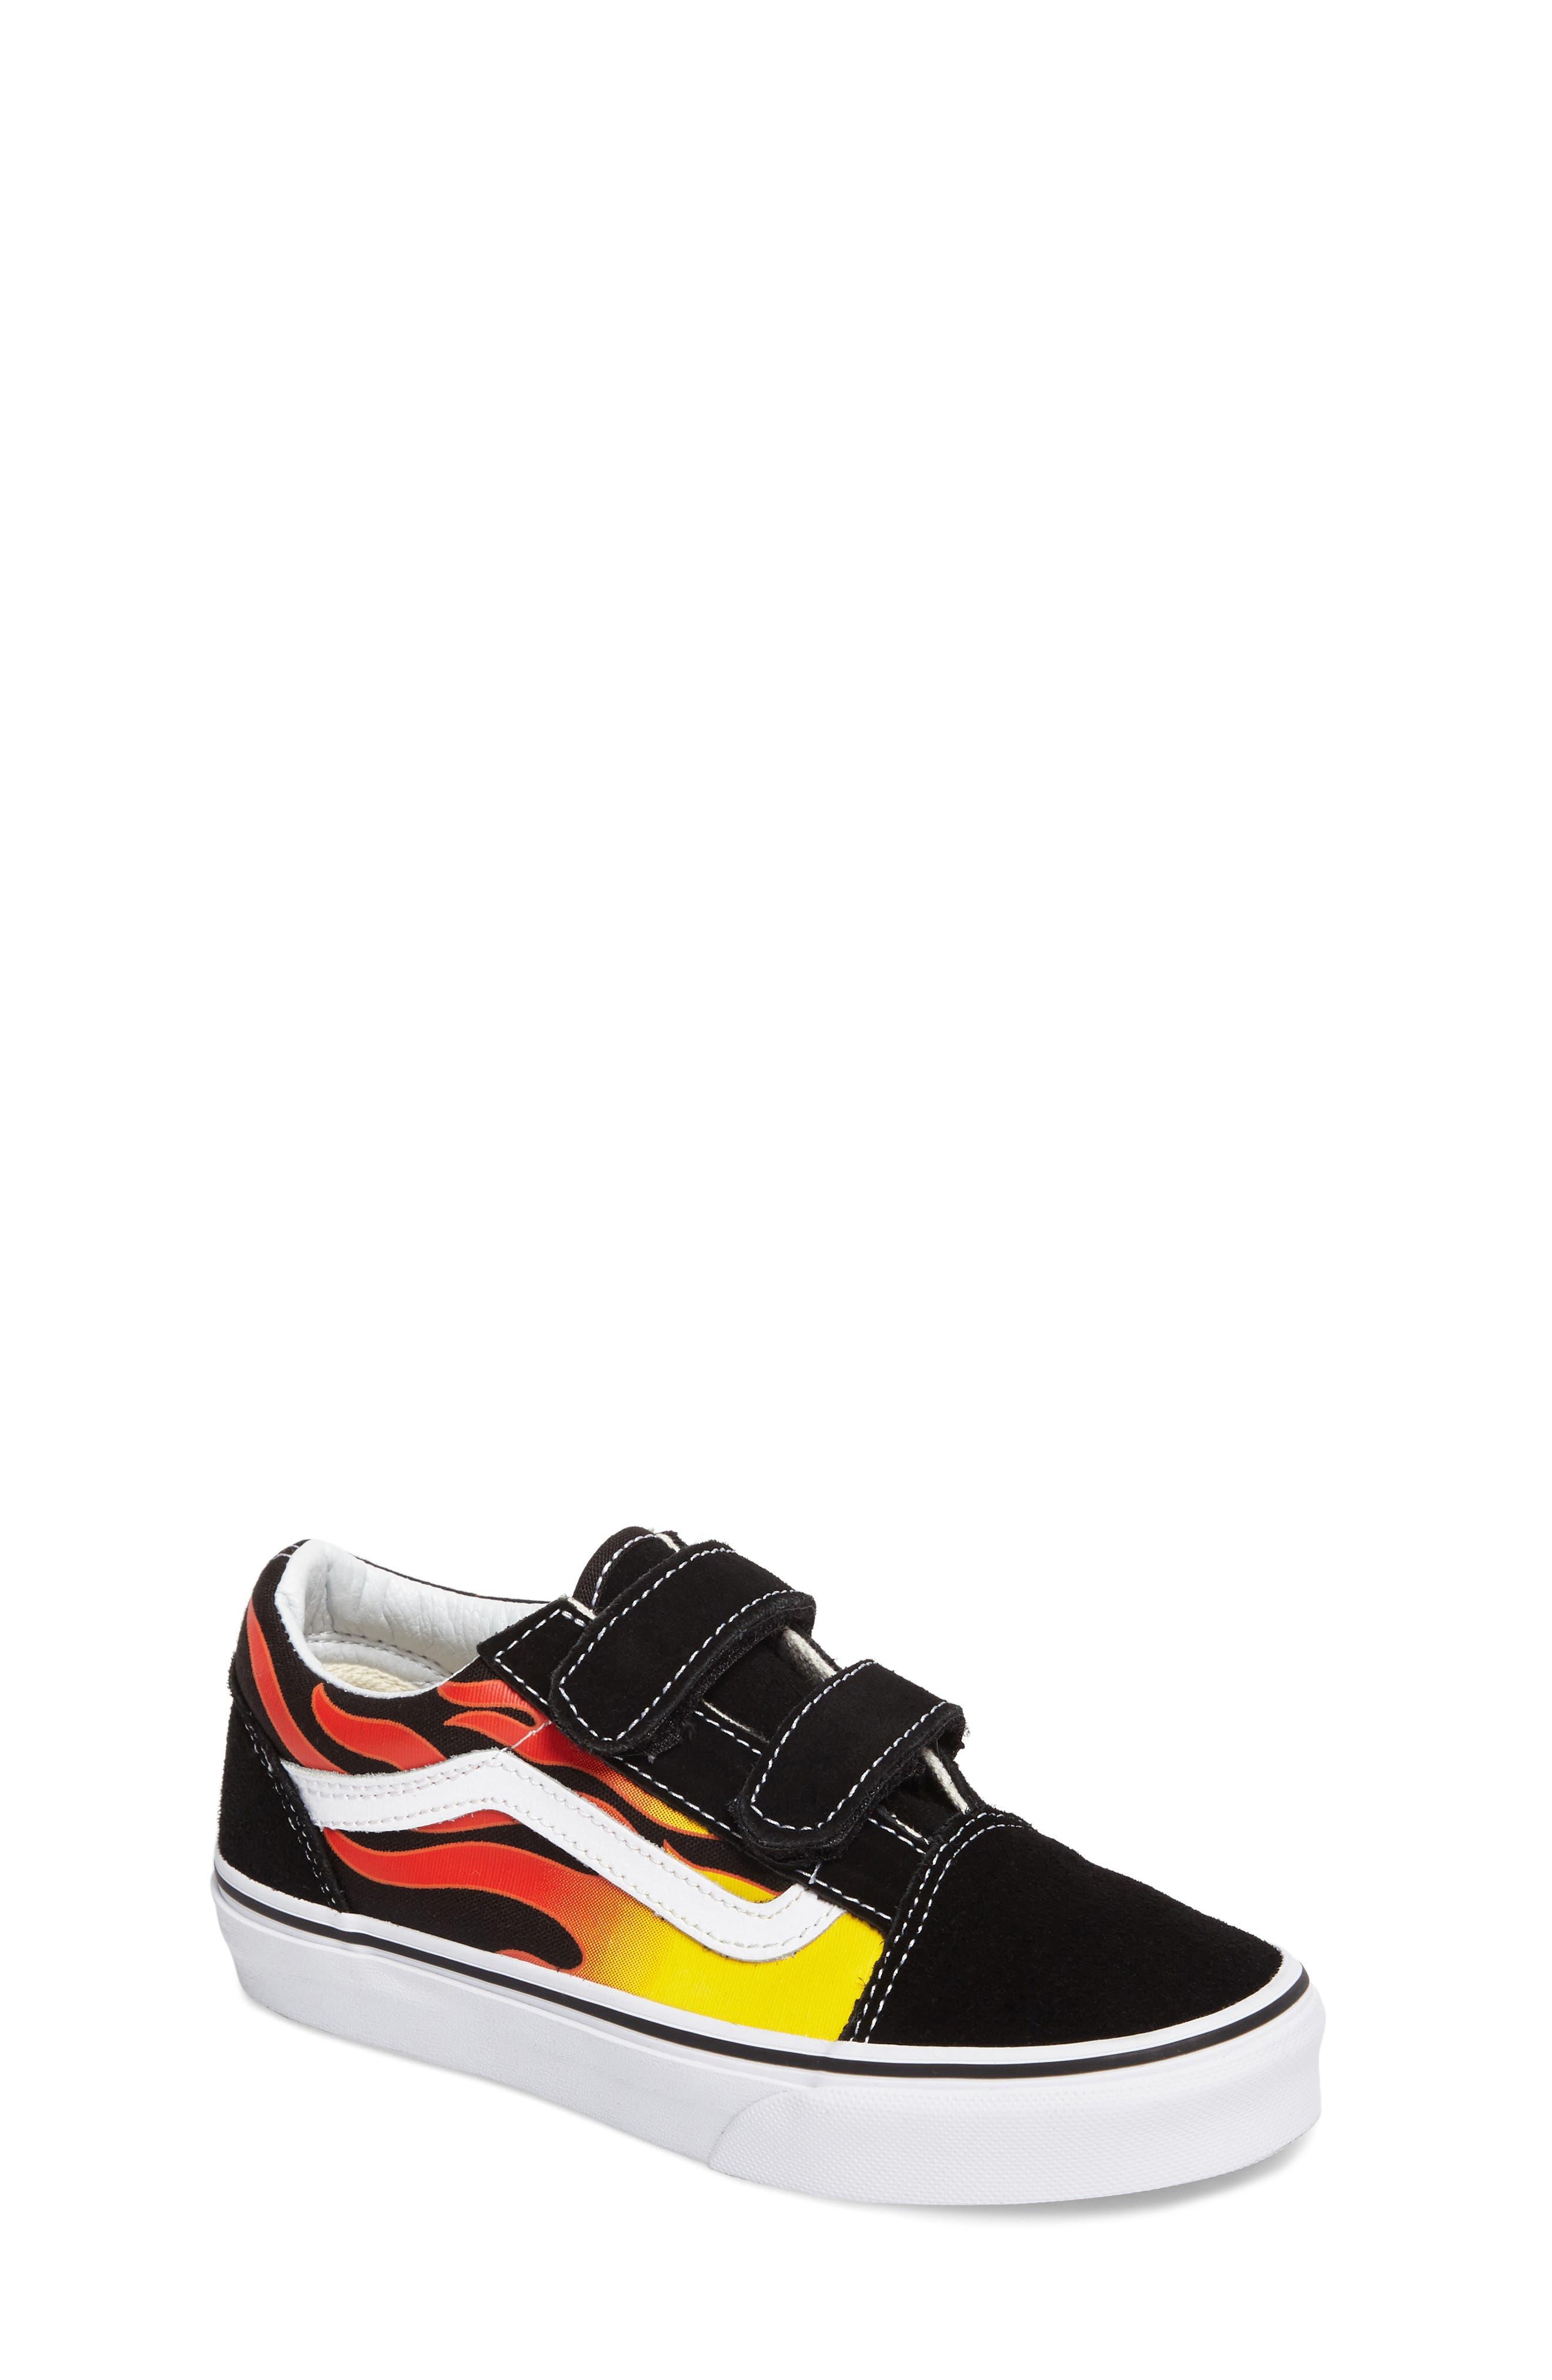 Main Image - Vans Old Skool V Sneaker (Baby, Walker, Toddler, Little Kid & Big Kid)